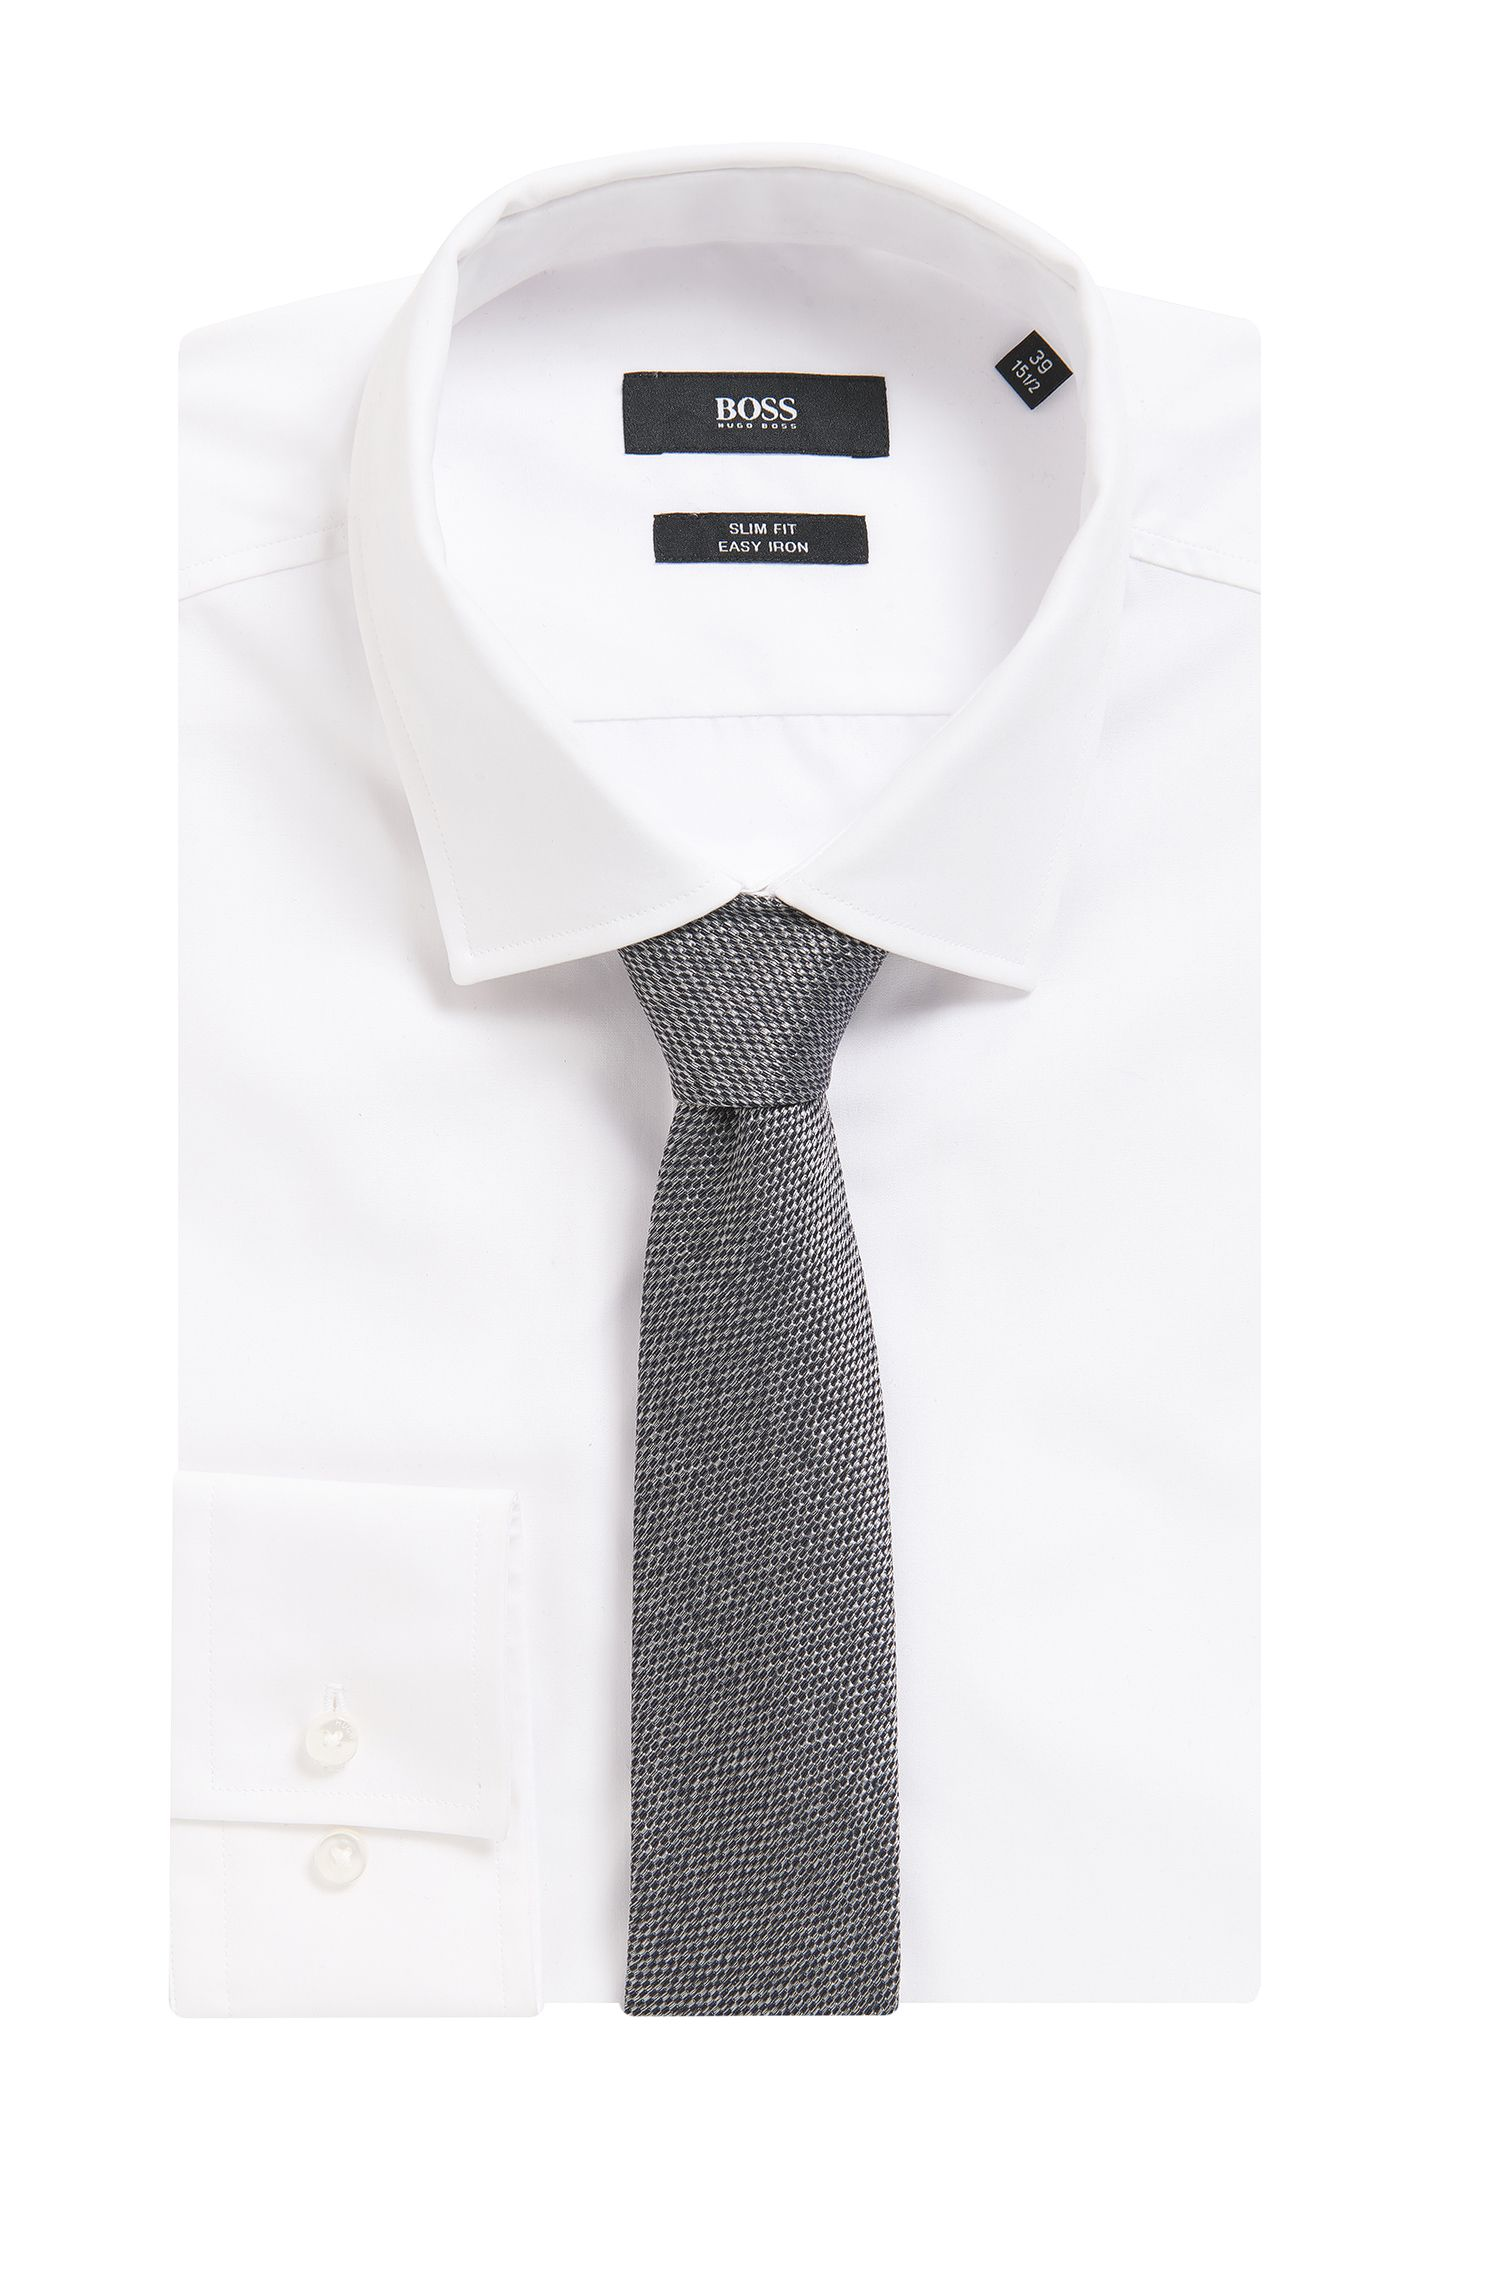 BOSS Tailored Sharkskin Italian Silk Slim Tie